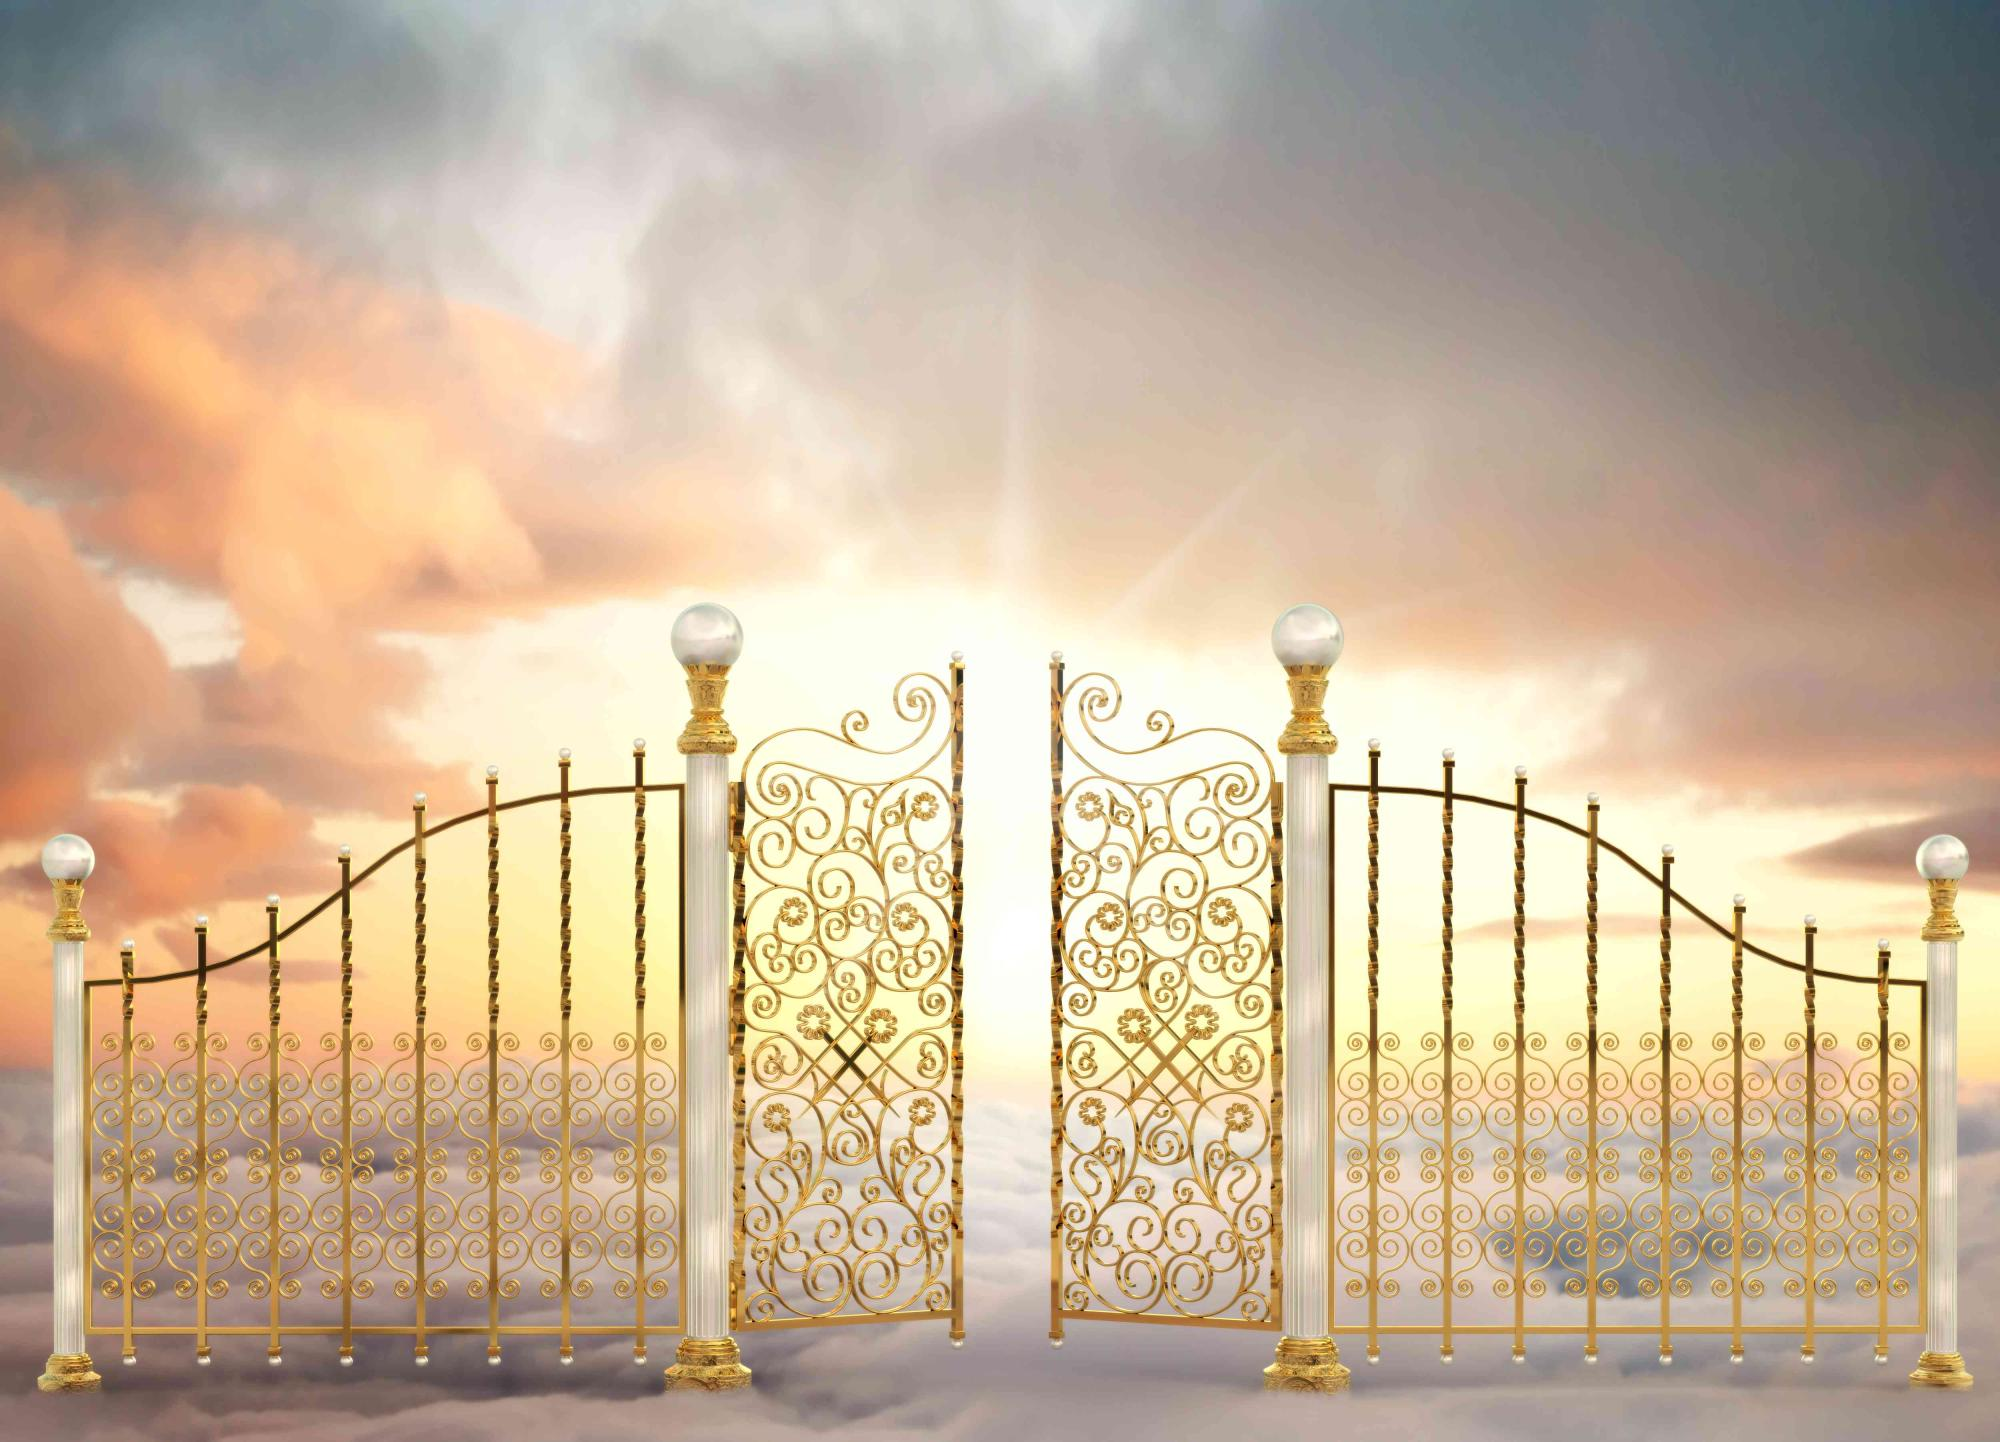 bigstock-Pearly-Gates-Landscape-7814216-c-r